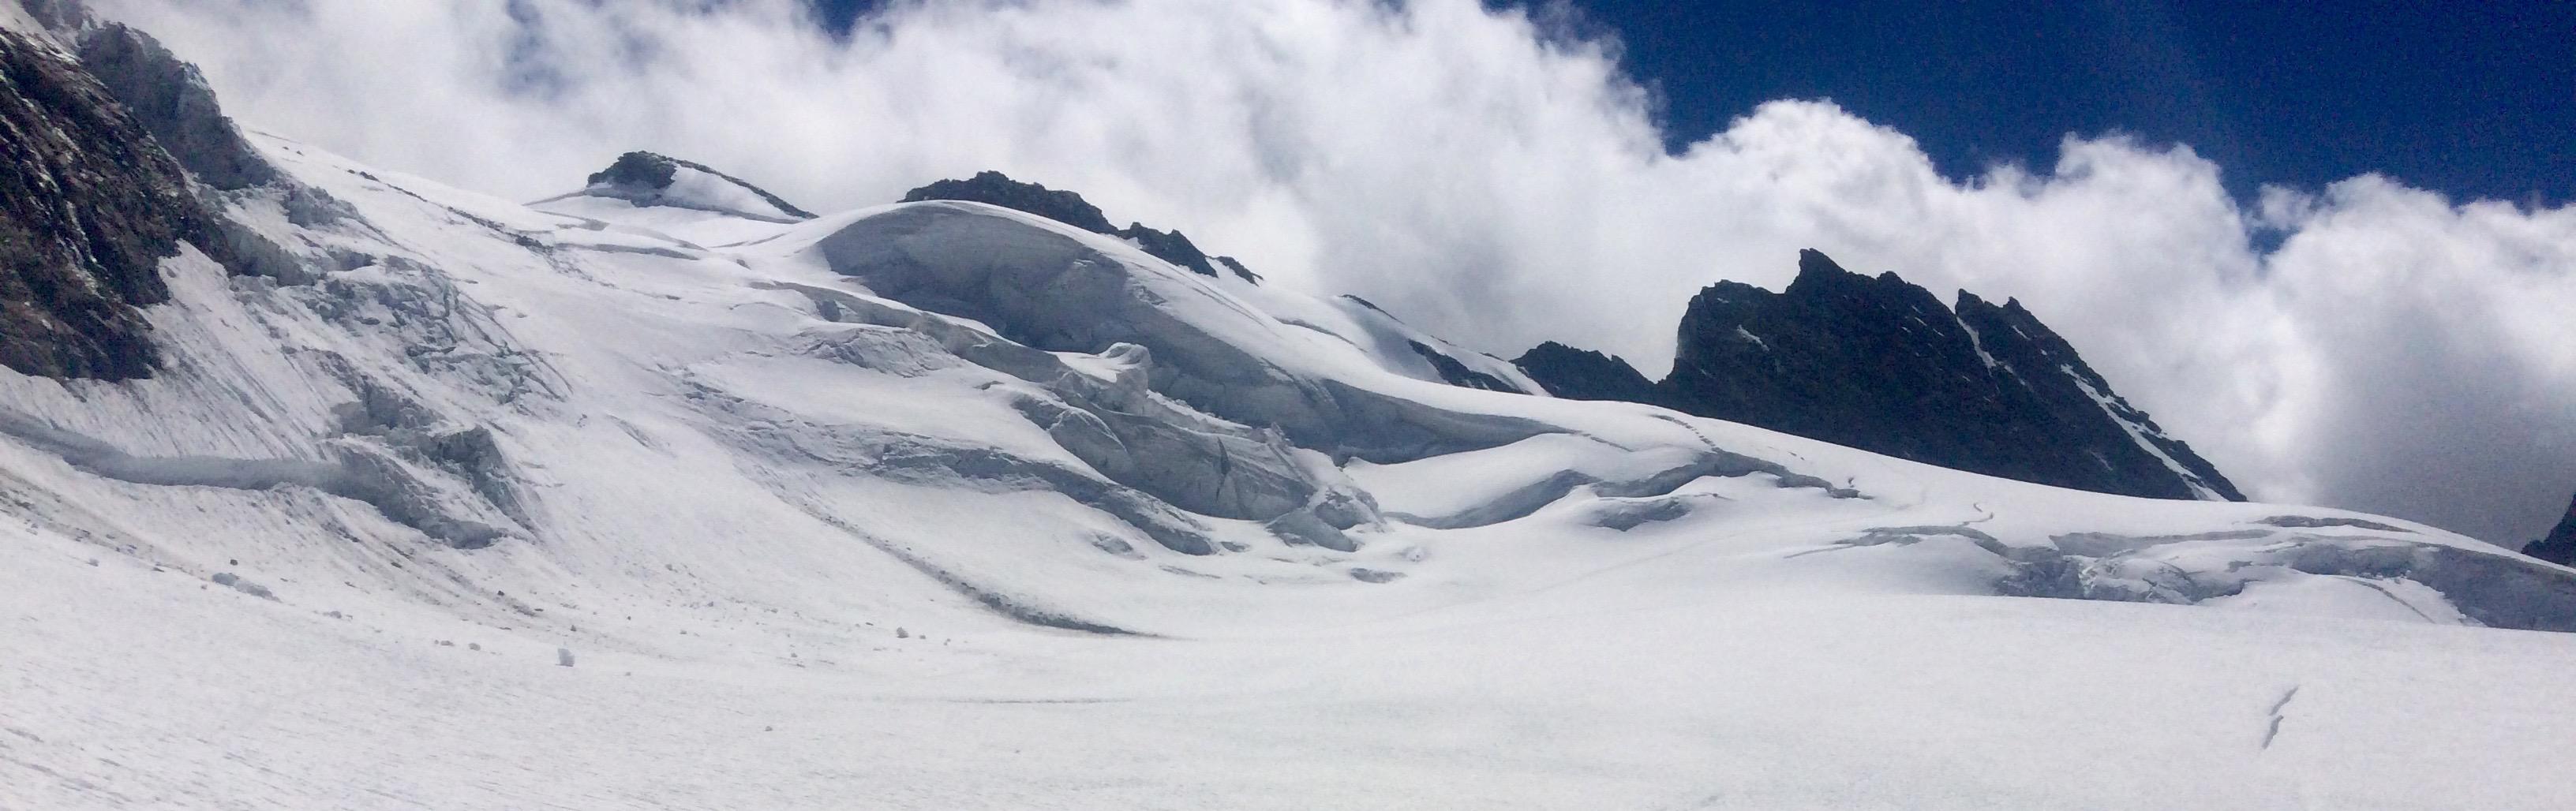 Overzicht gletsjer (1)